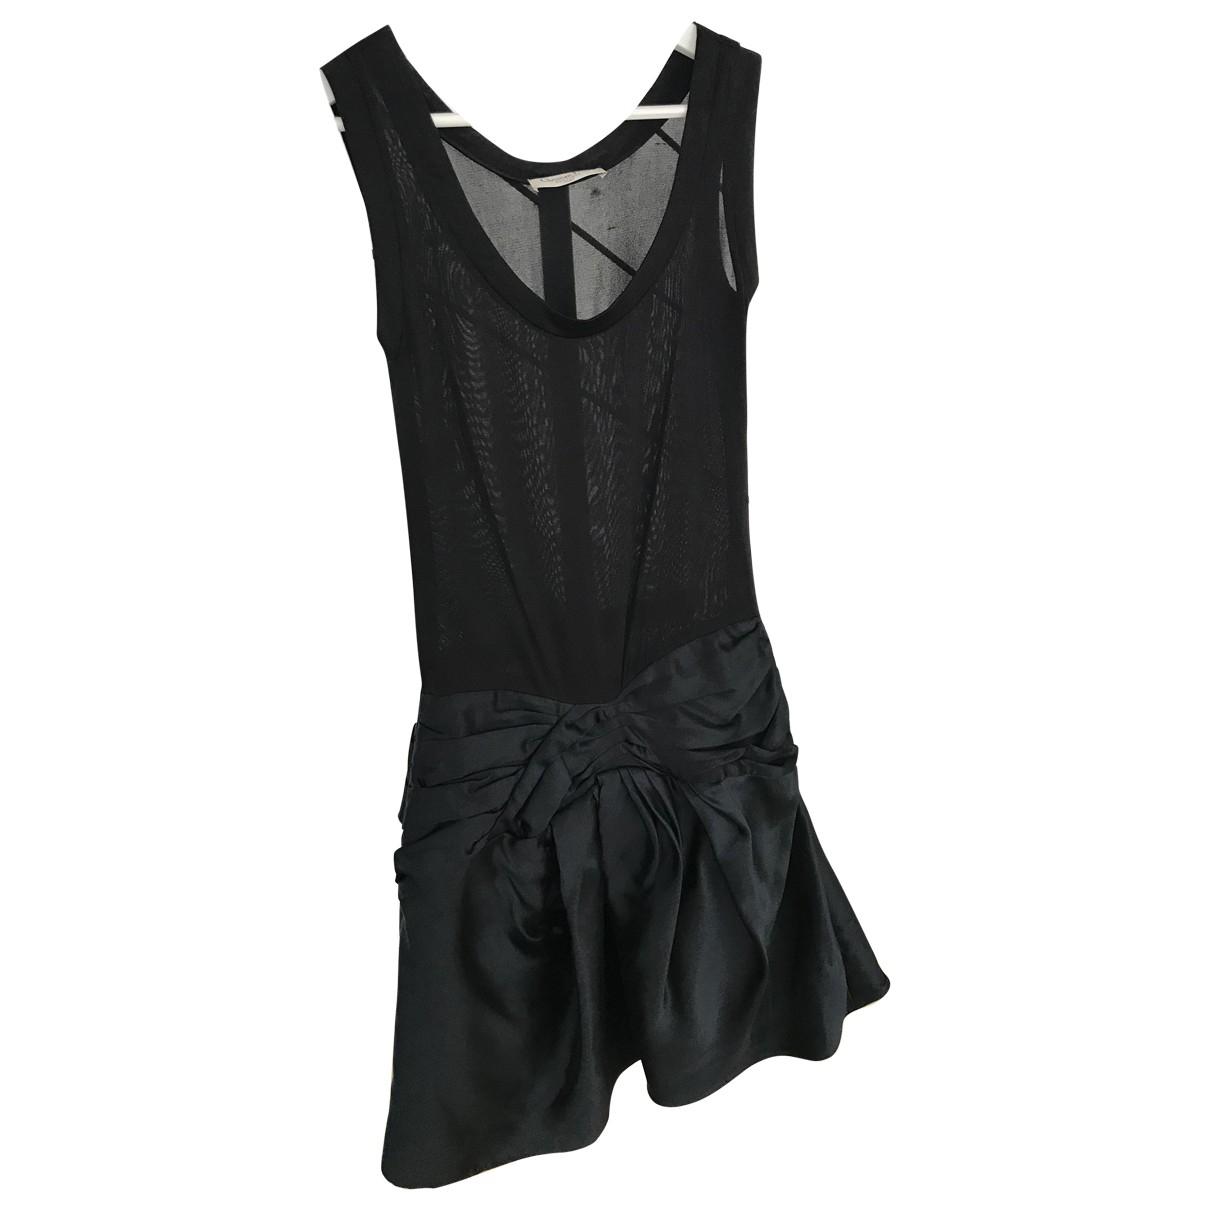 Dior \N Black dress for Women 34 FR